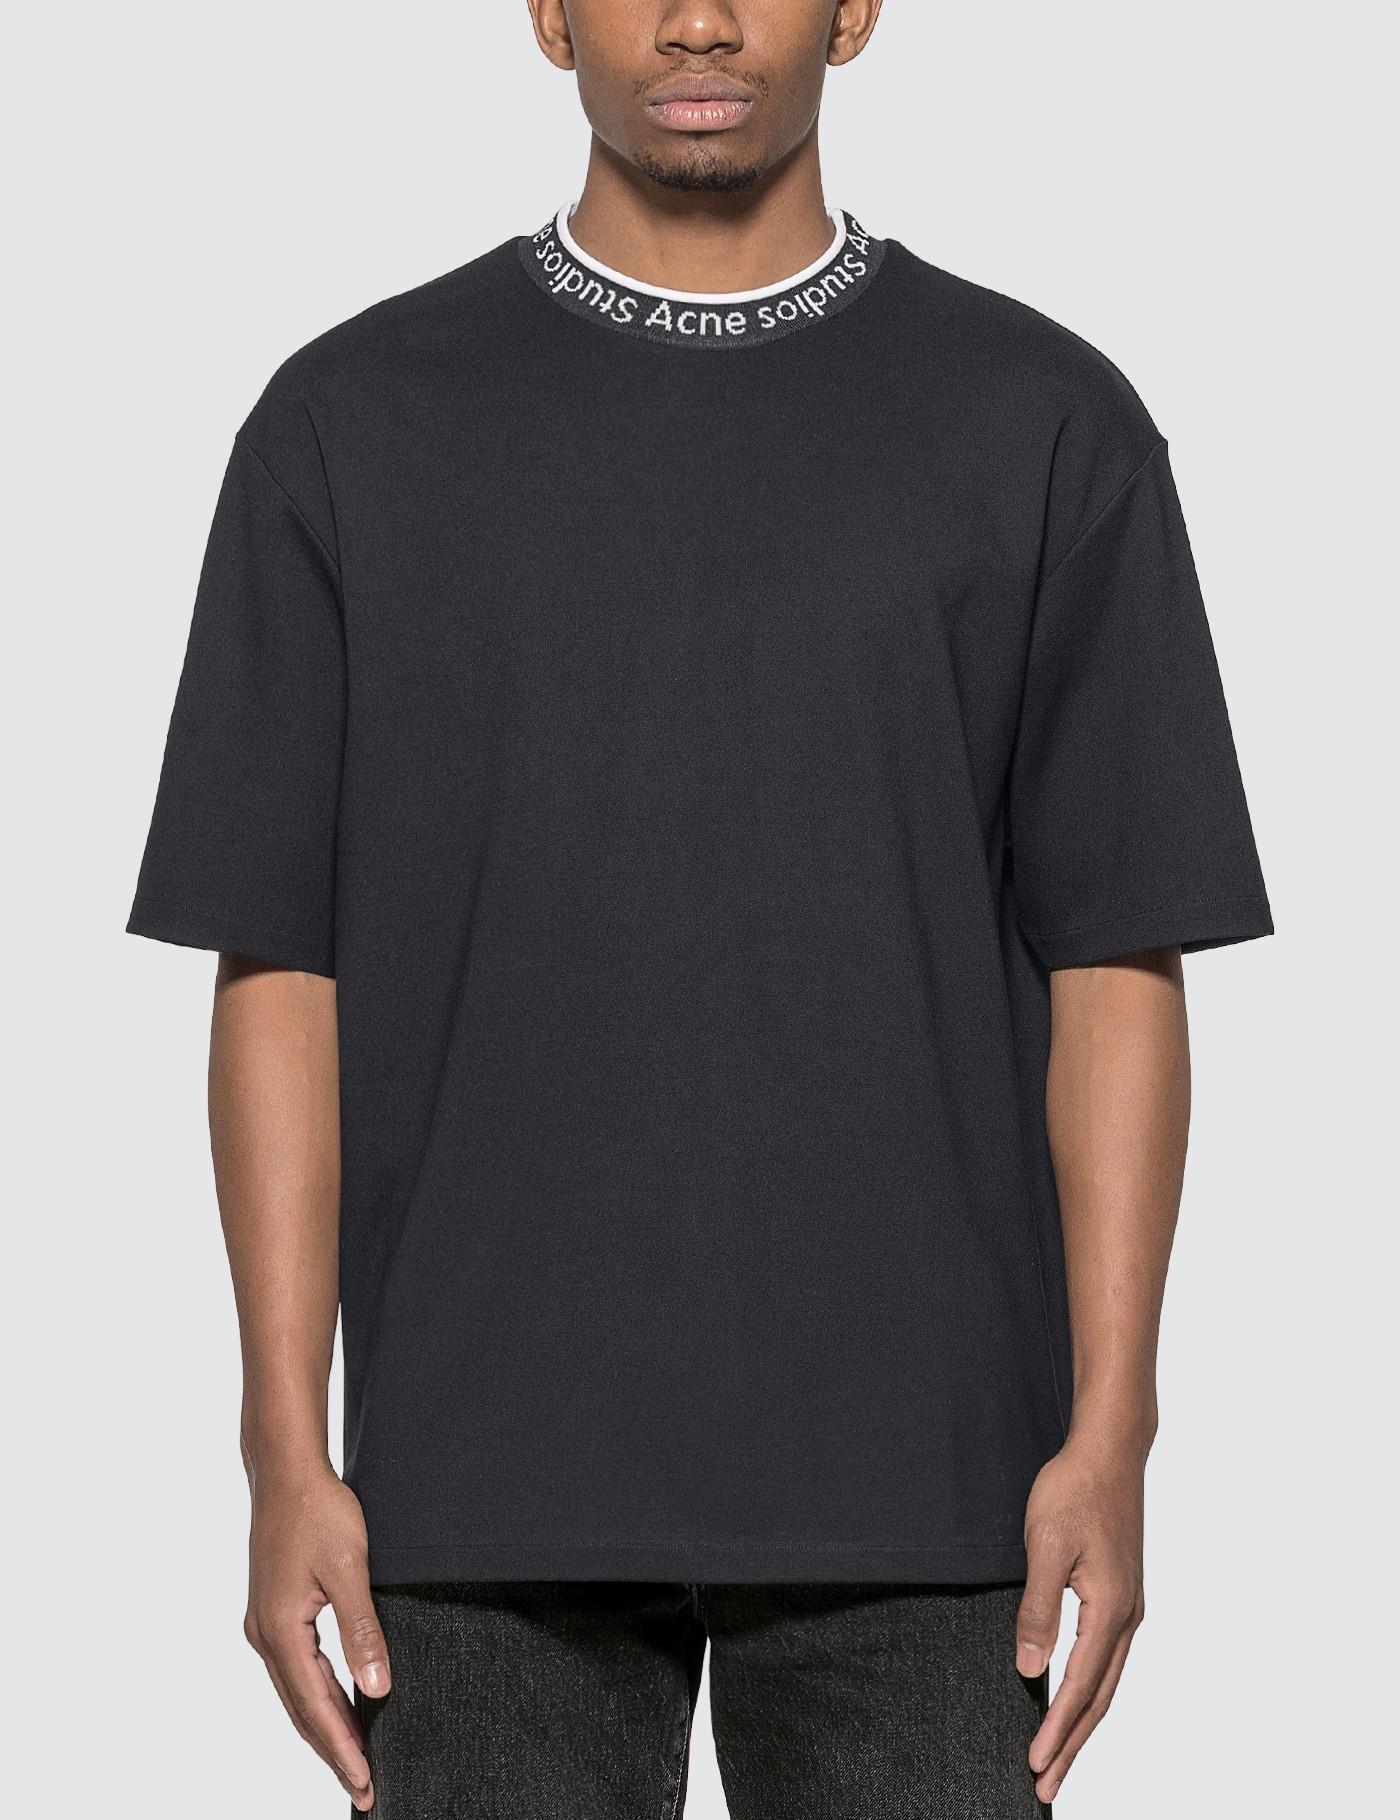 Acne Studios Synthetic Logo Neck T-shirt in Black for Men